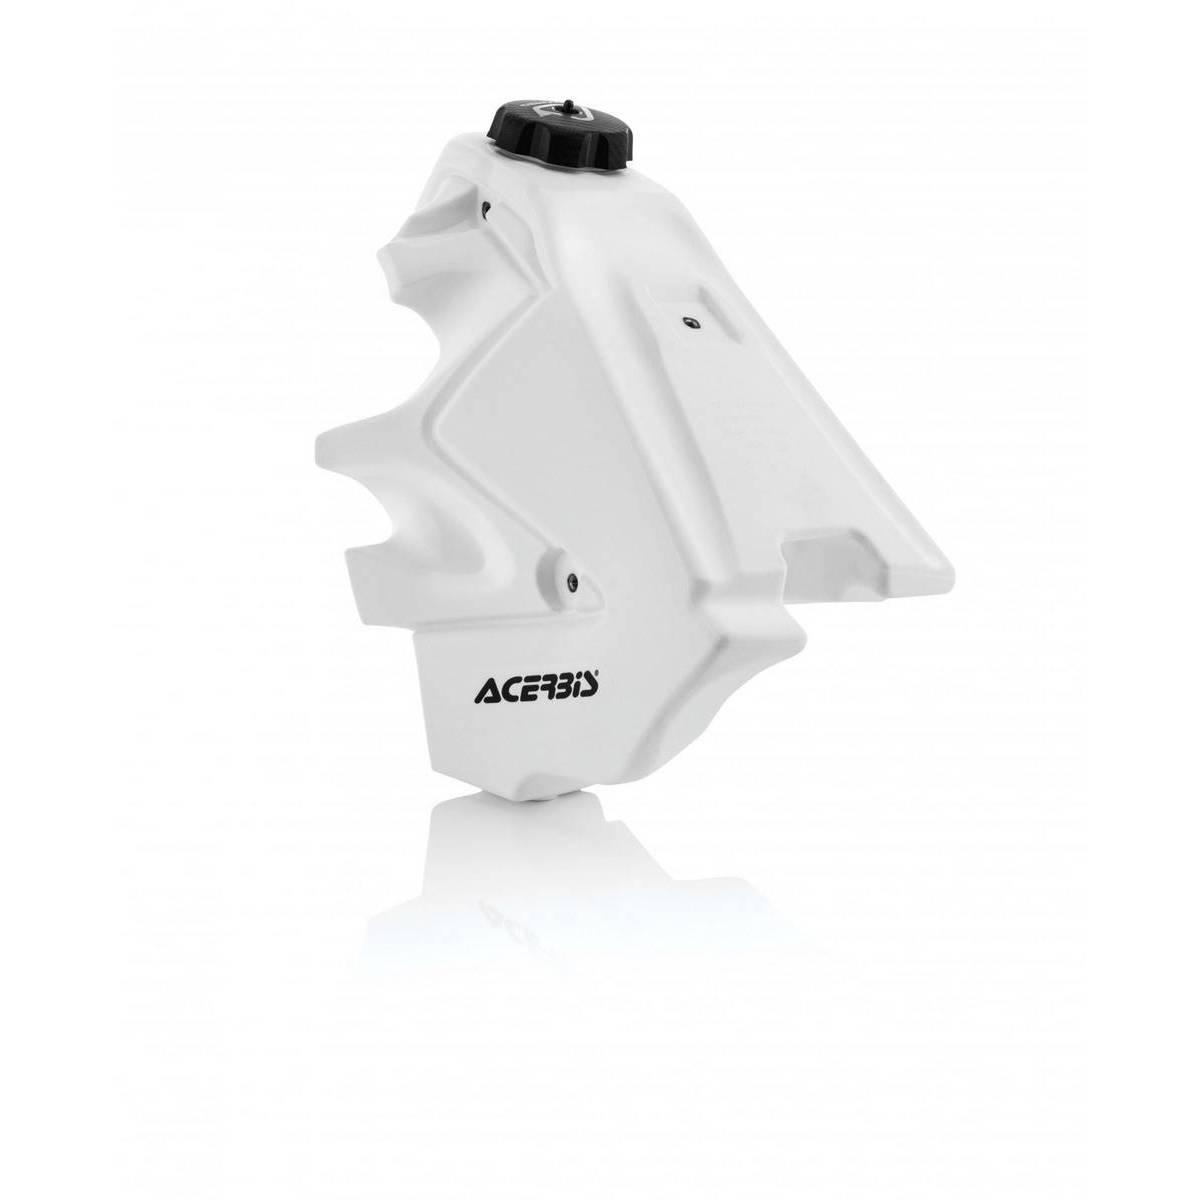 0016494-030 - Deposito Acerbis Yamaha Yz 85 07 17 8.5 Litros Blanco